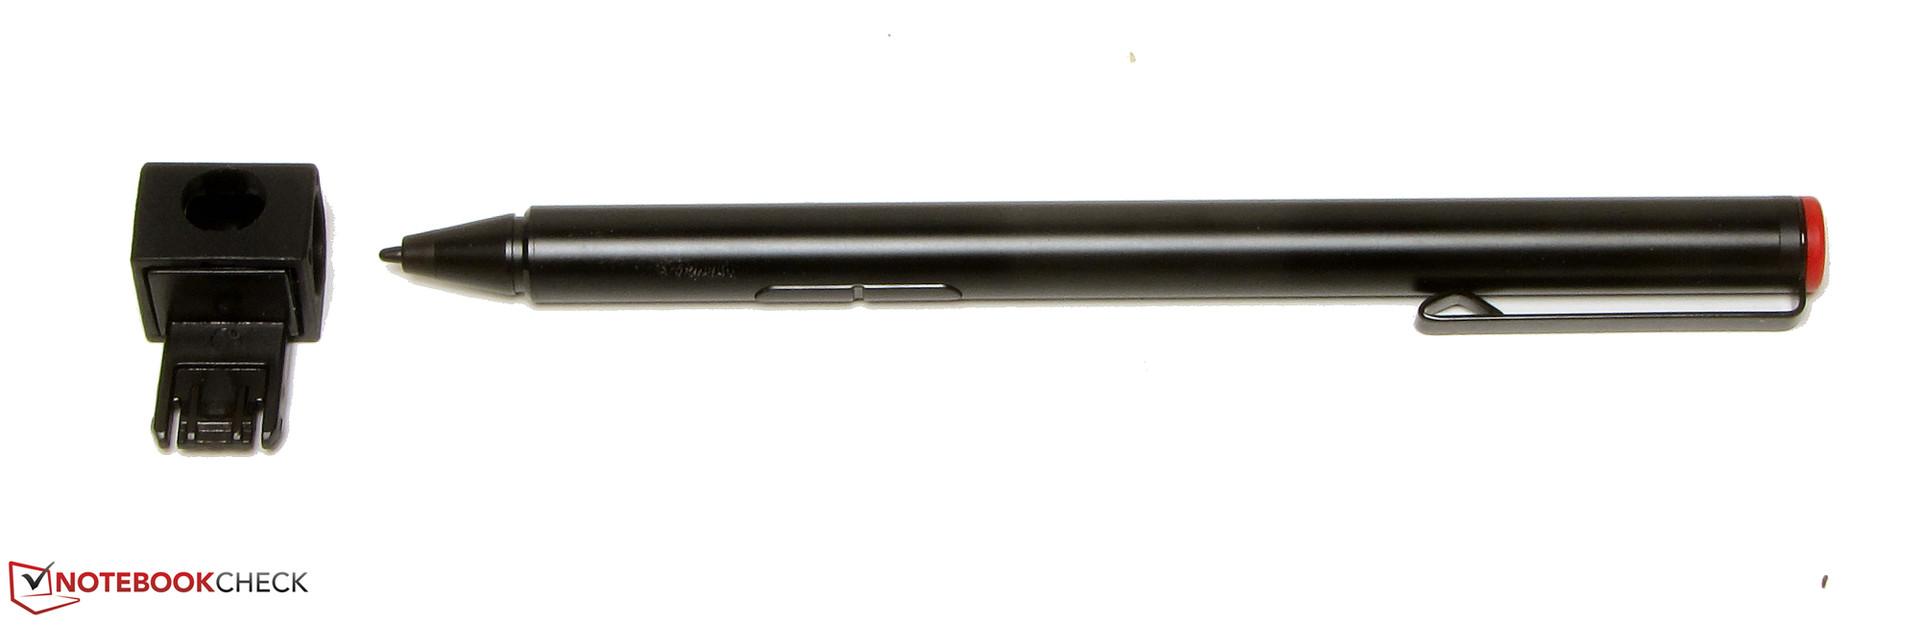 "Smart Keyboard for.5inch iPad Pro - US English - Apple M: Apple Smart Keyboard for.5"" iPad Pro"